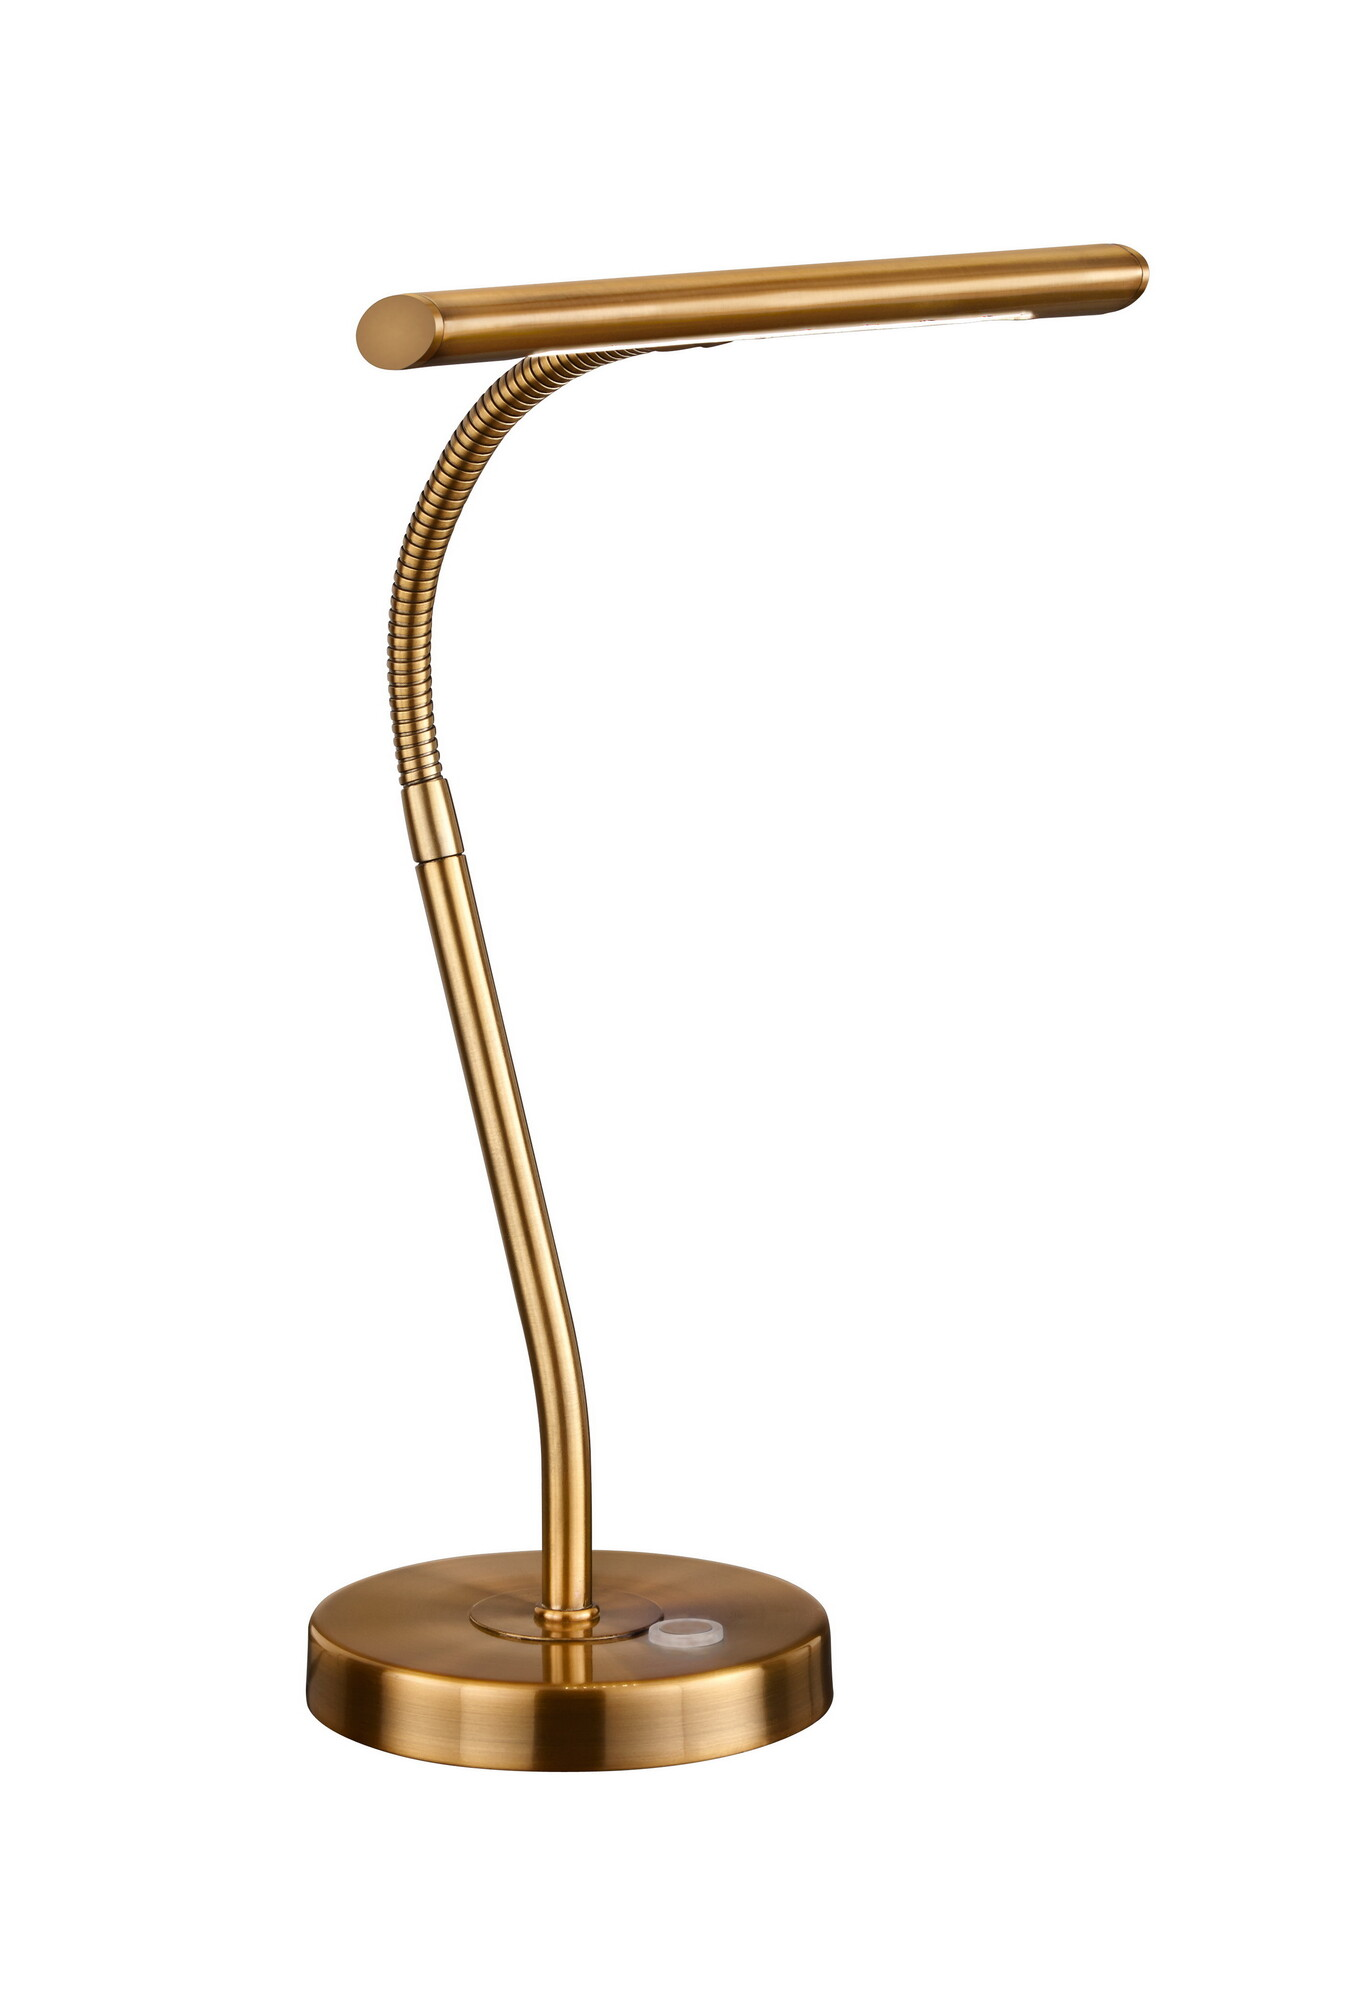 CURT tafellampen